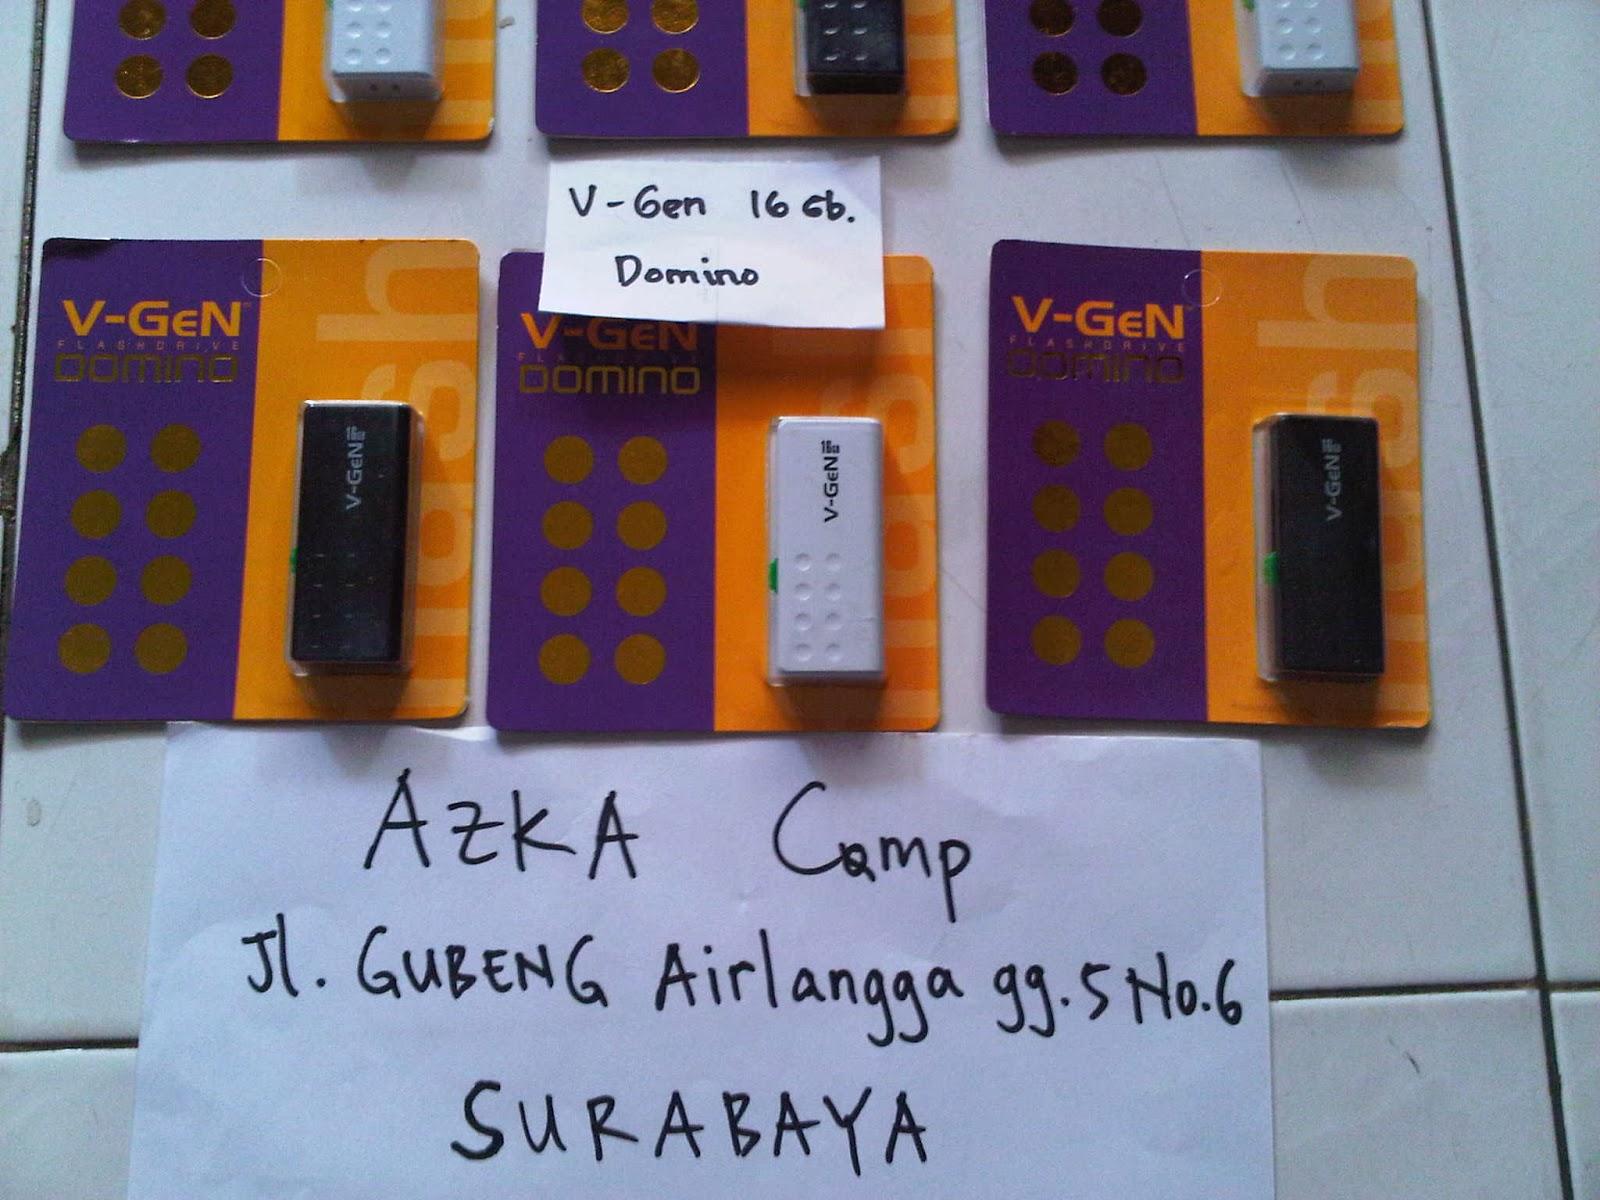 Azka Computer Surabaya Flash Disk V Gen Lifetime Warranty Flashdisk Vgen 8gb Domino 16gb